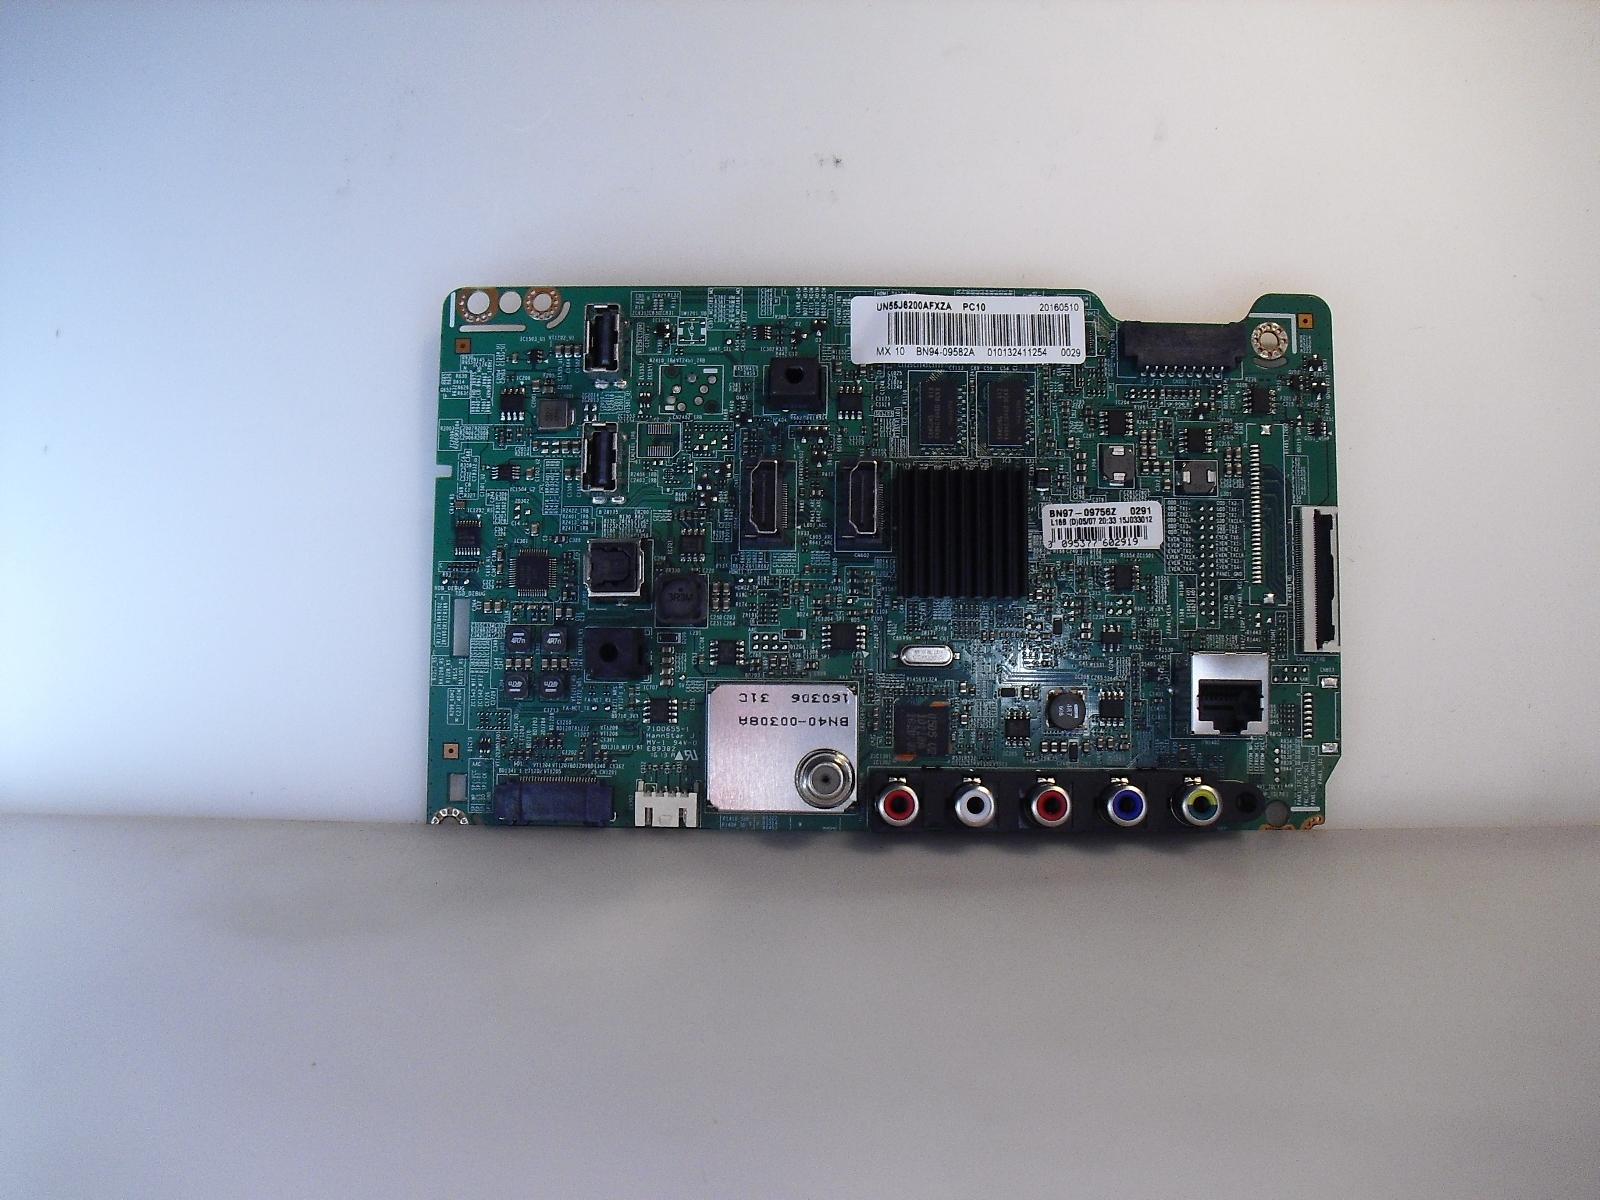 bn41-02245a   main  board   for  samsung  un50j6200af